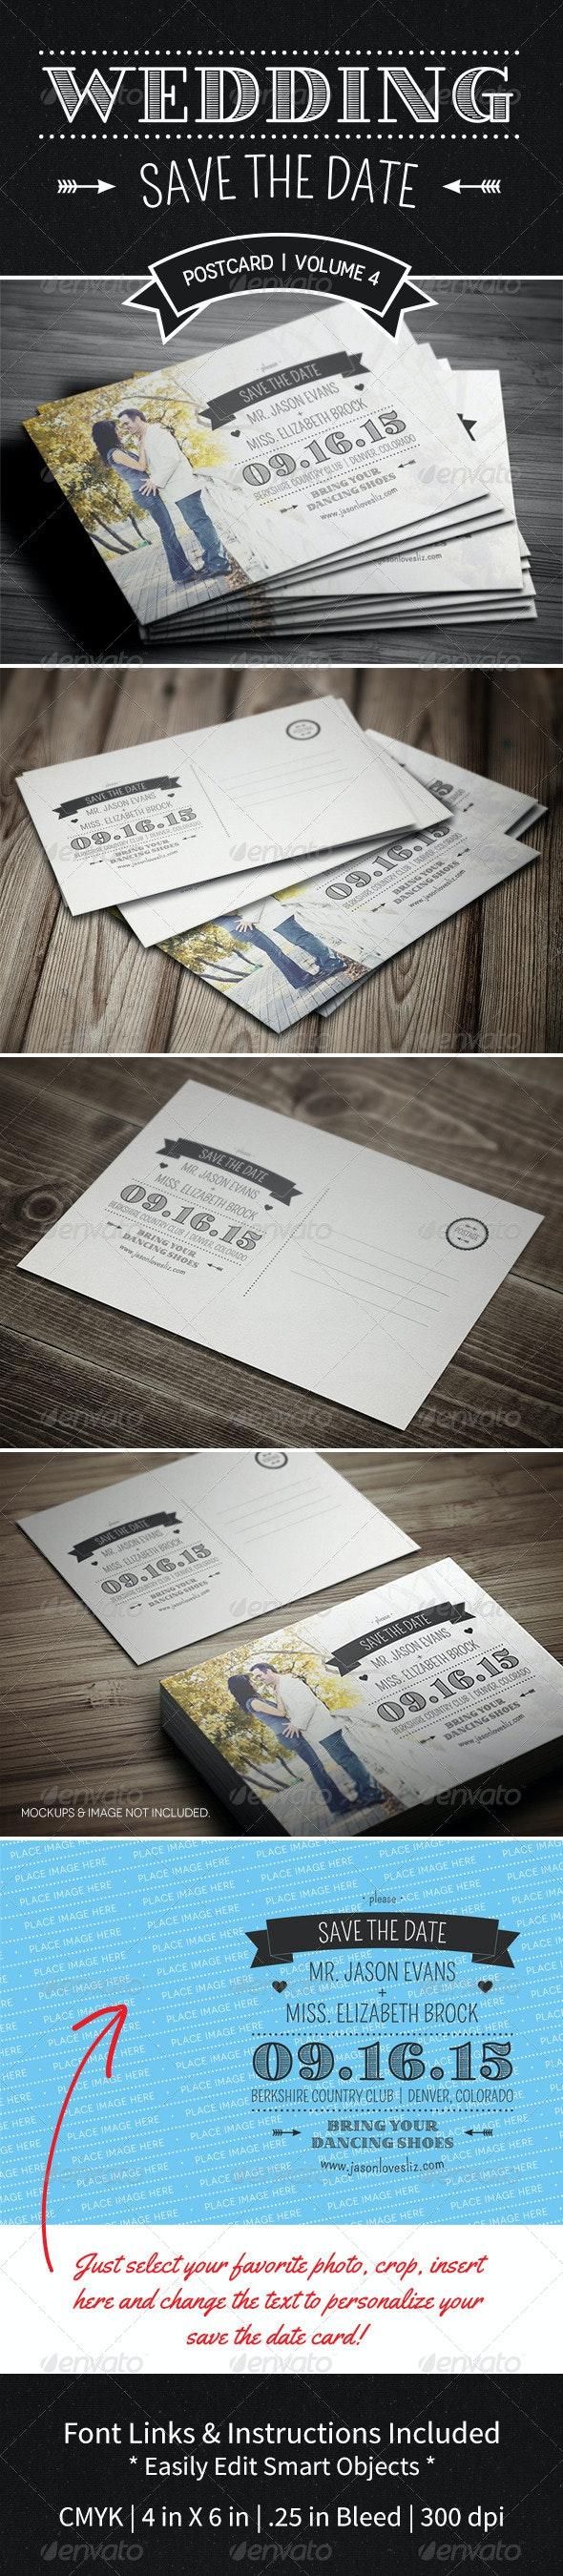 Save The Date Postcard | Volume 4 - Weddings Cards & Invites